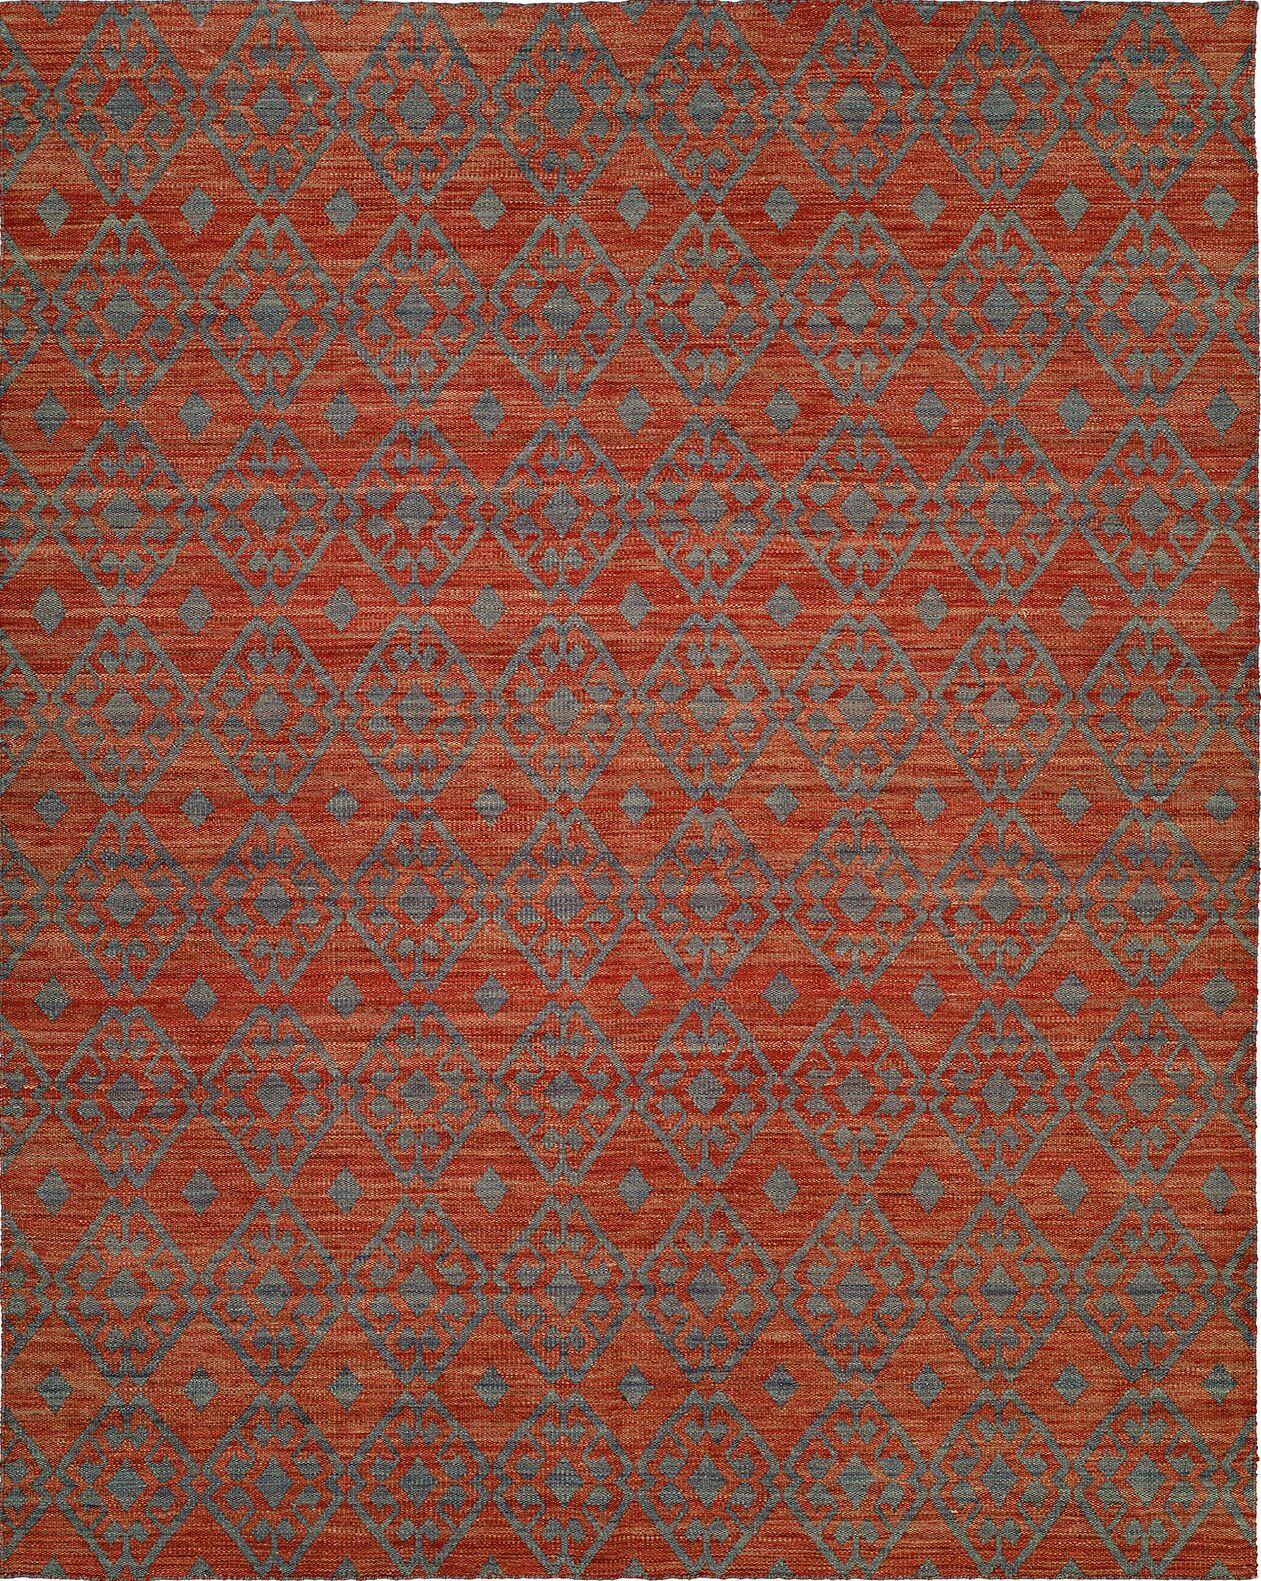 Hand-Woven Brown/Gray Area Rug Rug Size: 5' x 8'